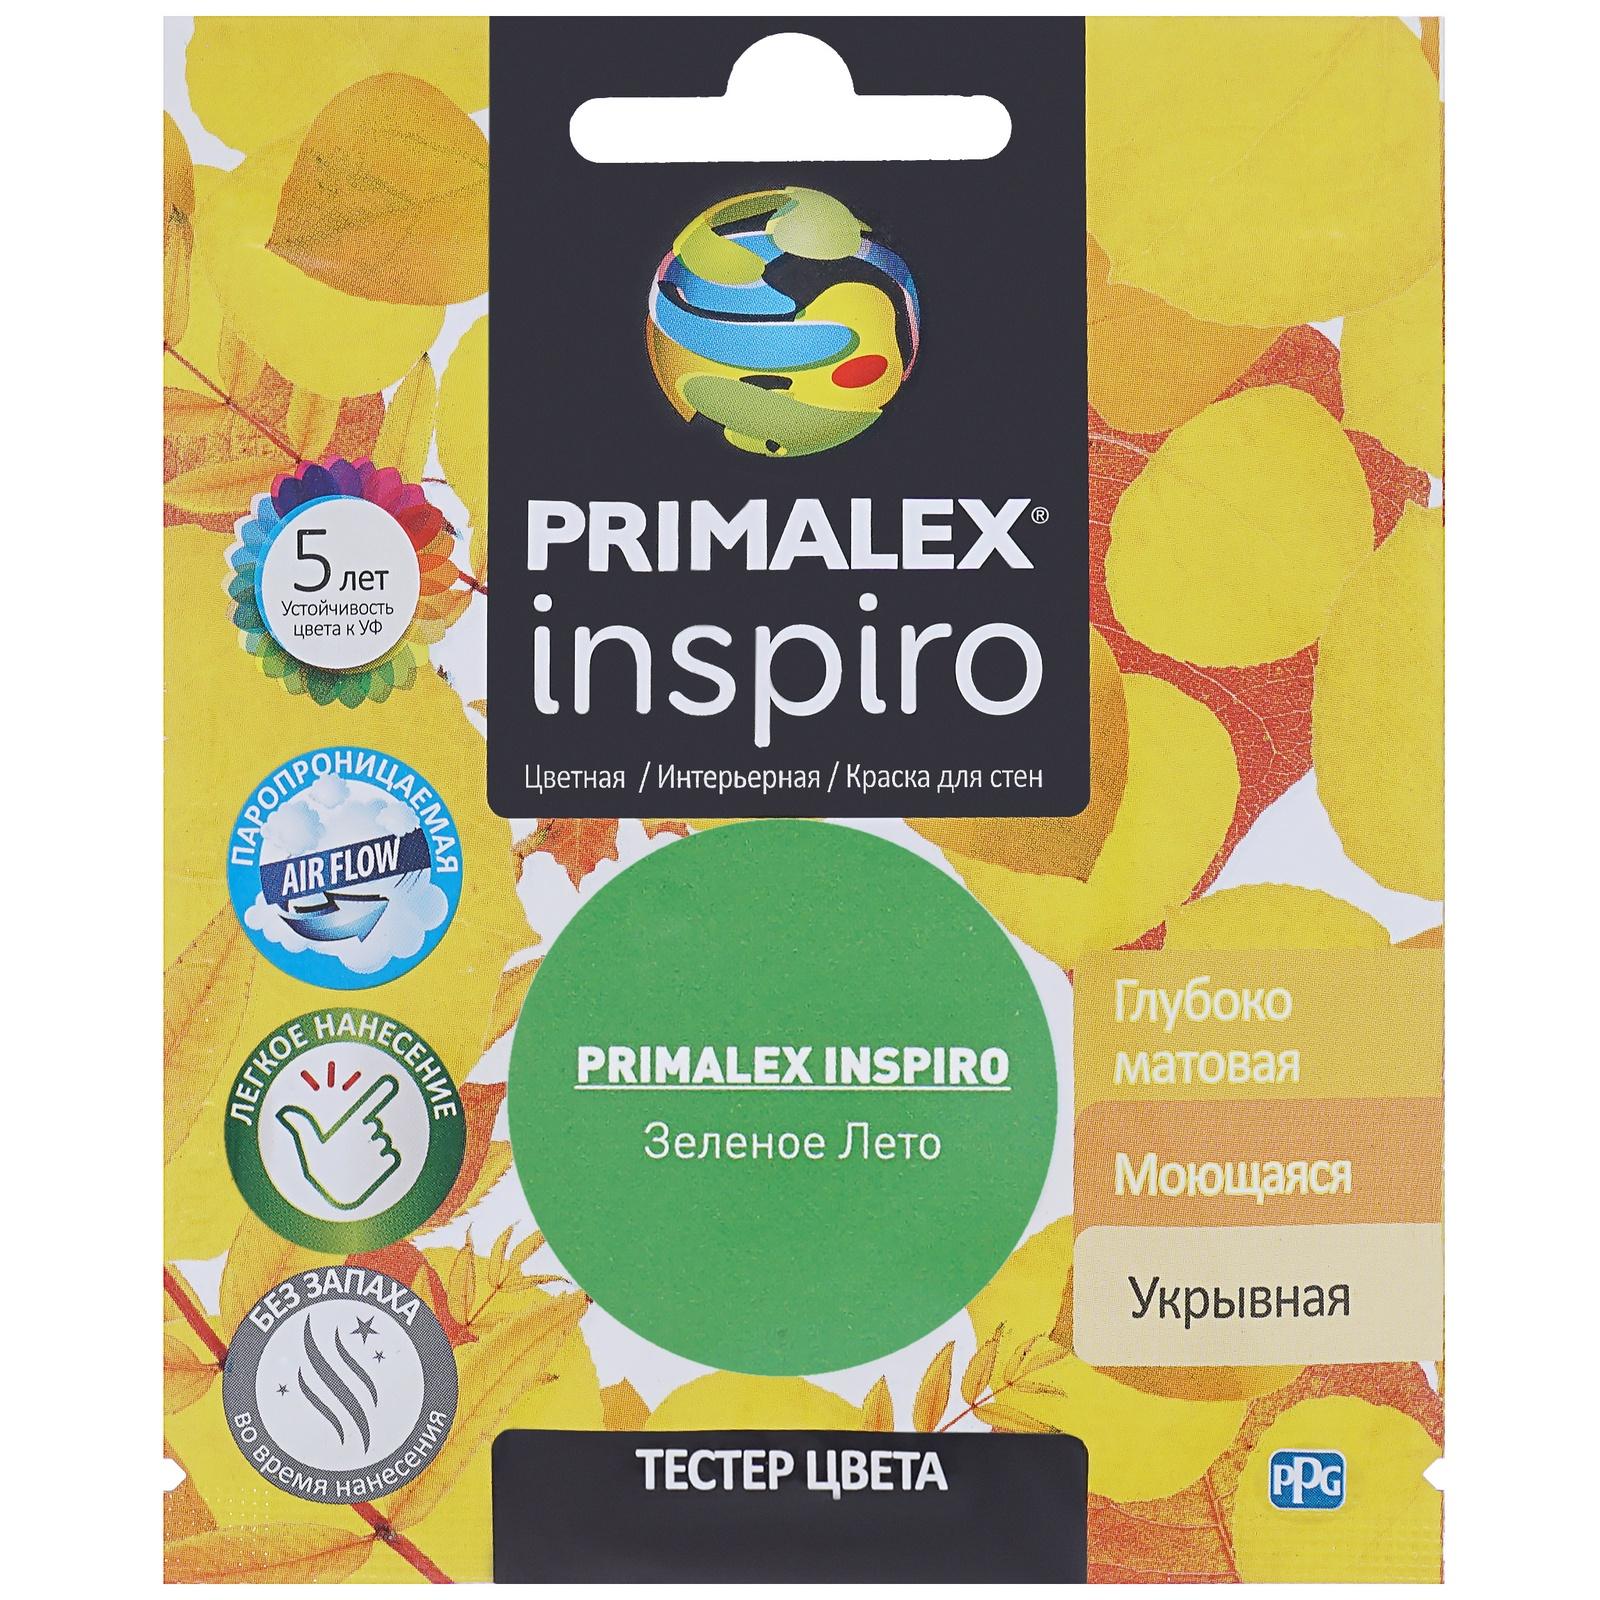 Краска Primalex Inspiro Зеленое Лето 40мл краска ppg primalex inspiro красный мак 40мл pmx i47